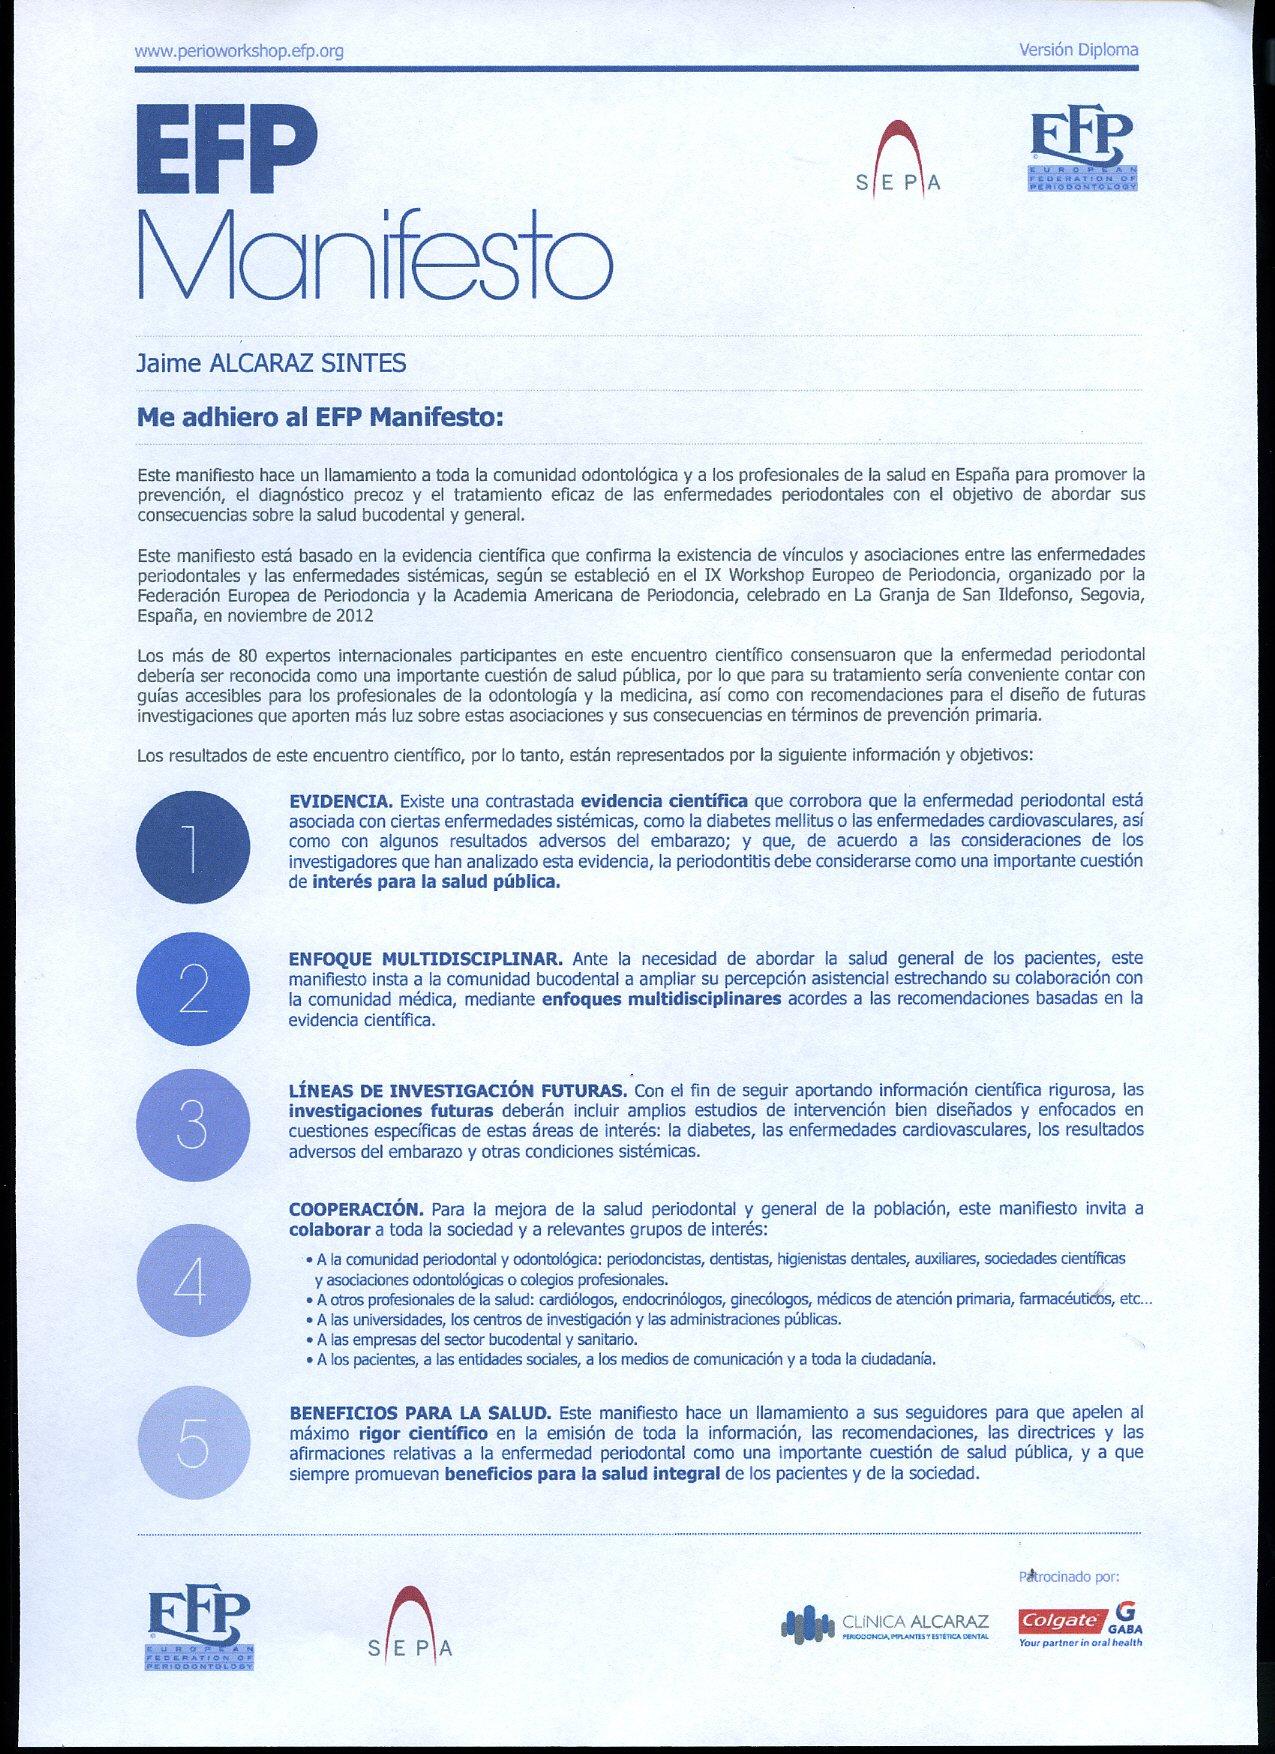 manifiesto efp